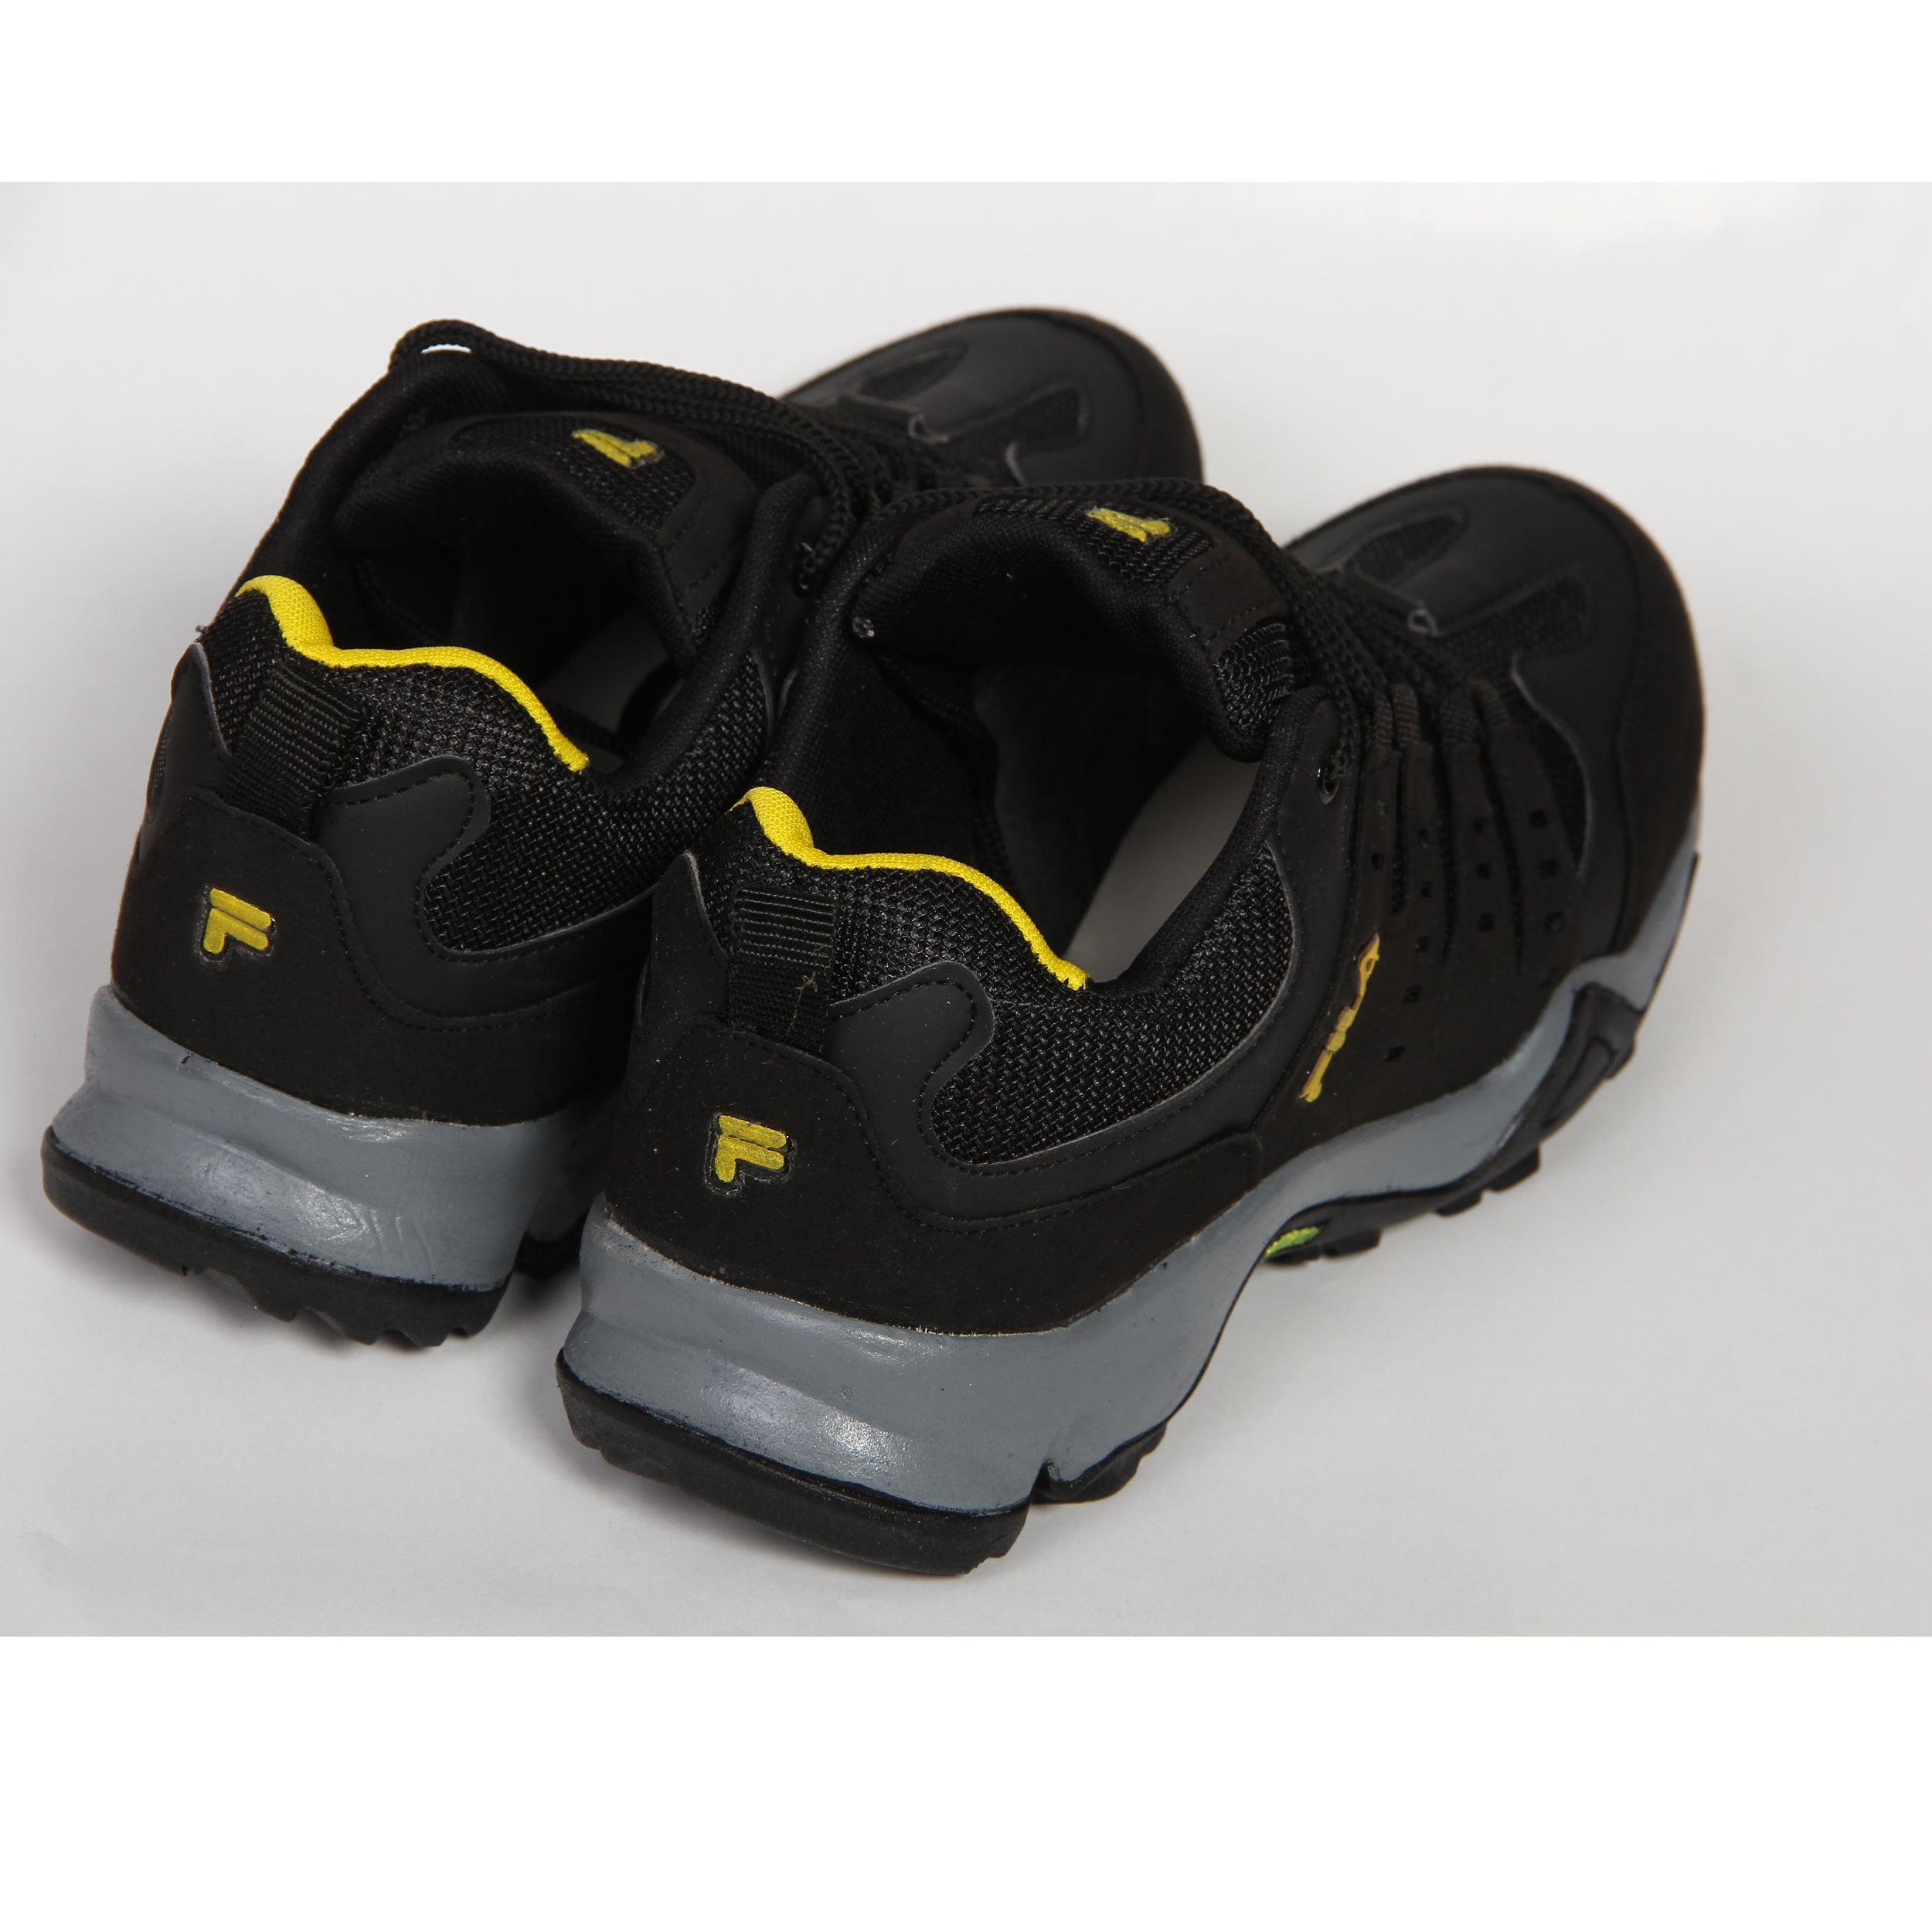 خرید                      کفش کوهنوردی مردانه مدل میلاد کد 444